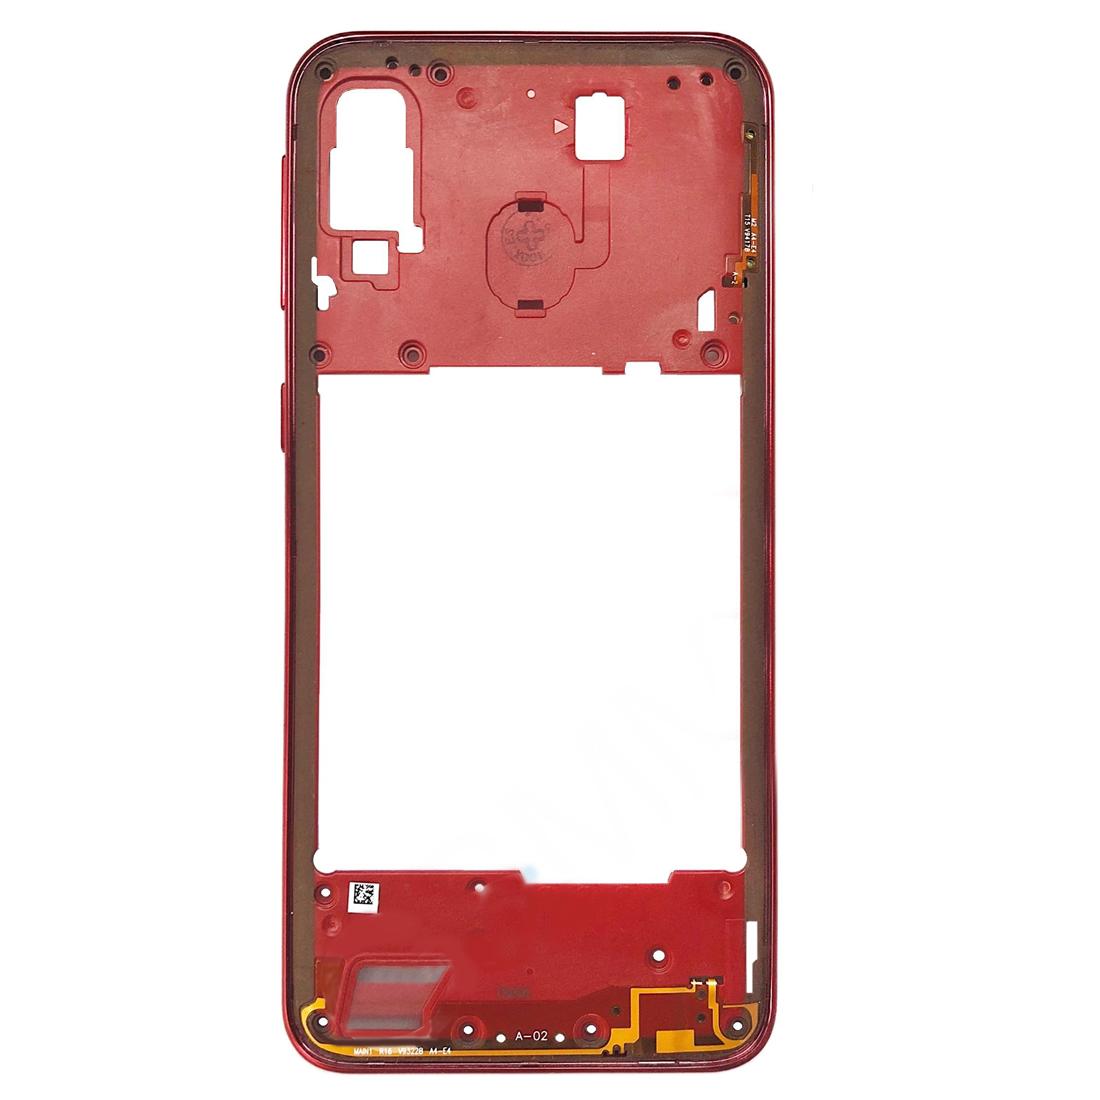 Carcasa intermedia para Samsung Galaxy A40 A405F – Rojo